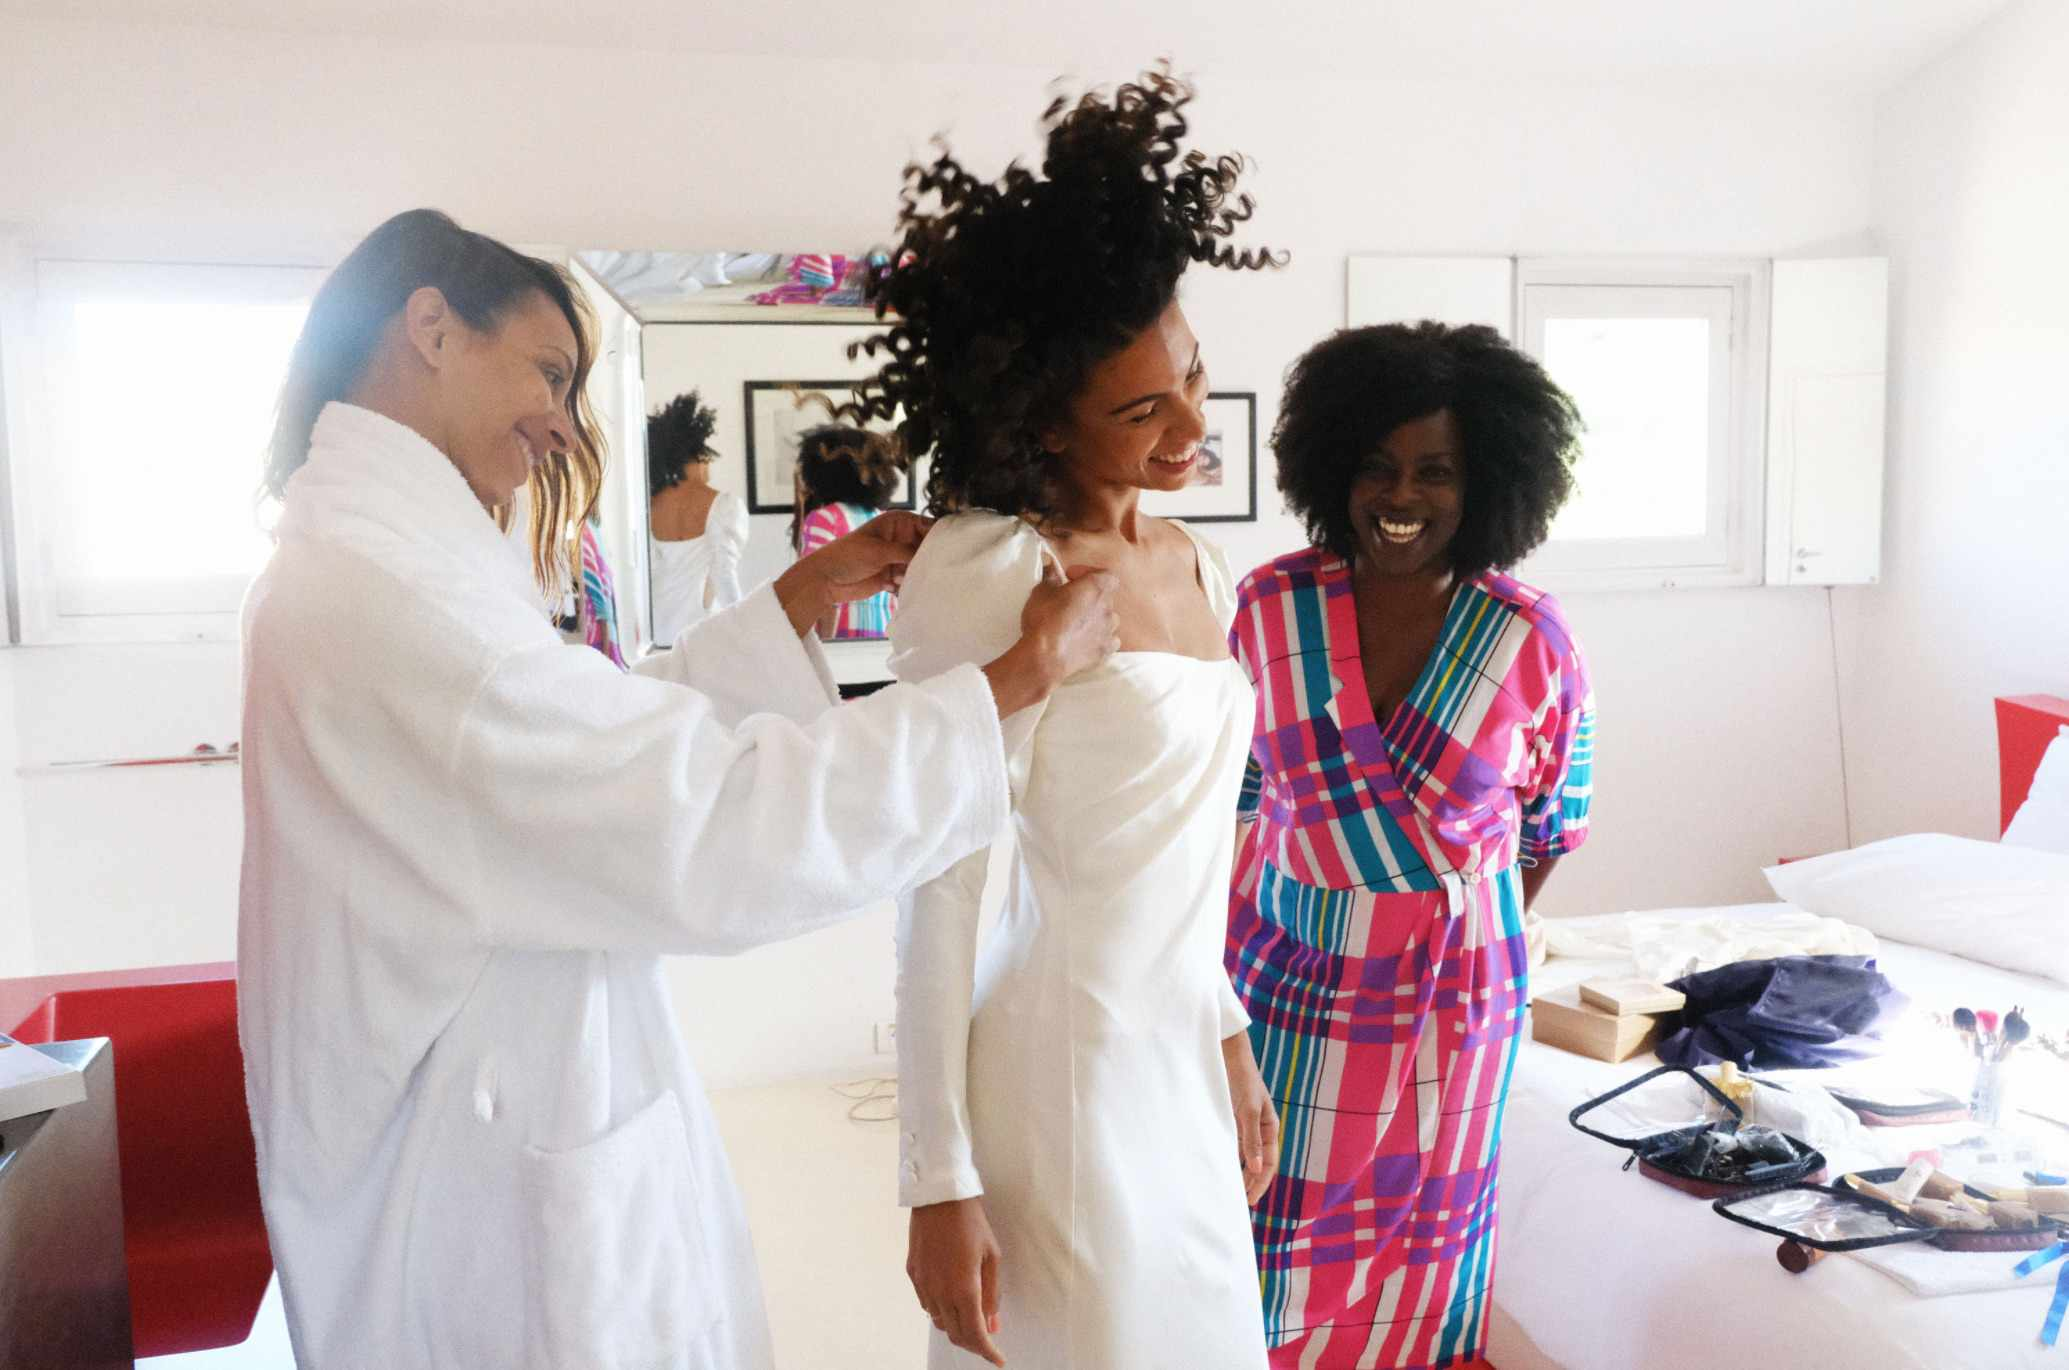 Happy bride getting into dress